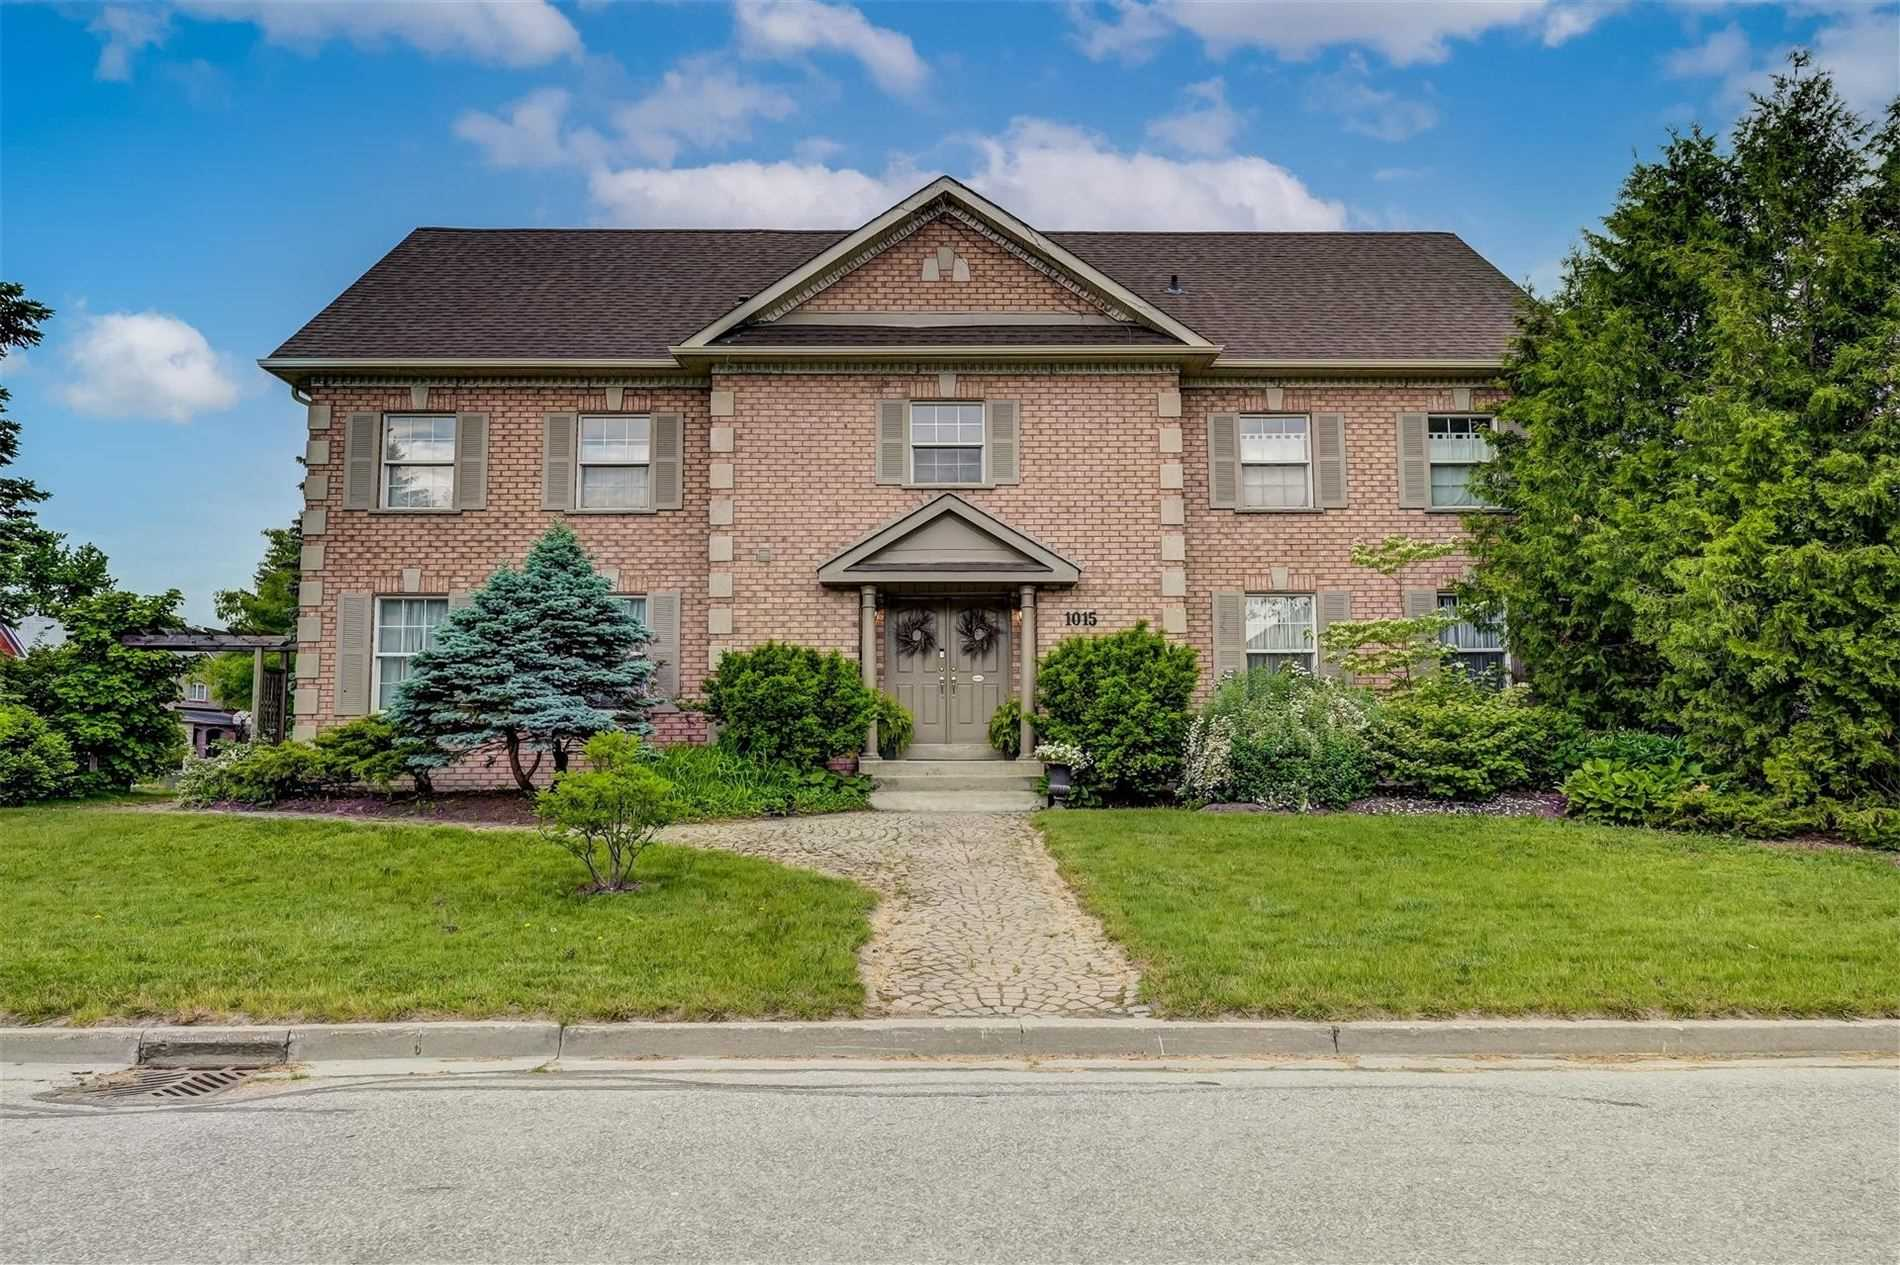 1015 Creebridge Cres, Newmarket Ontario, Canada